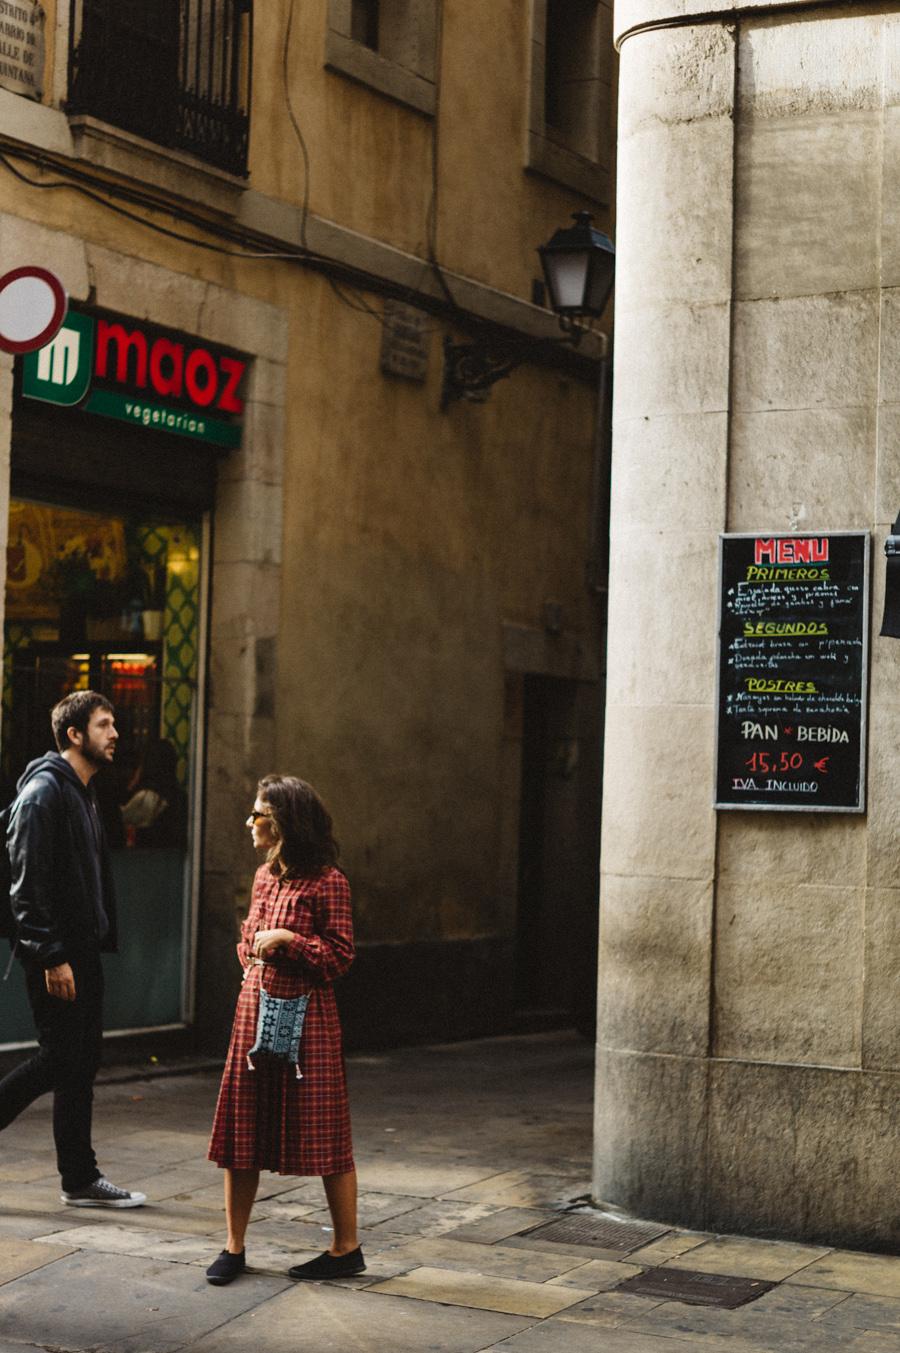 059-barcelona.jpg